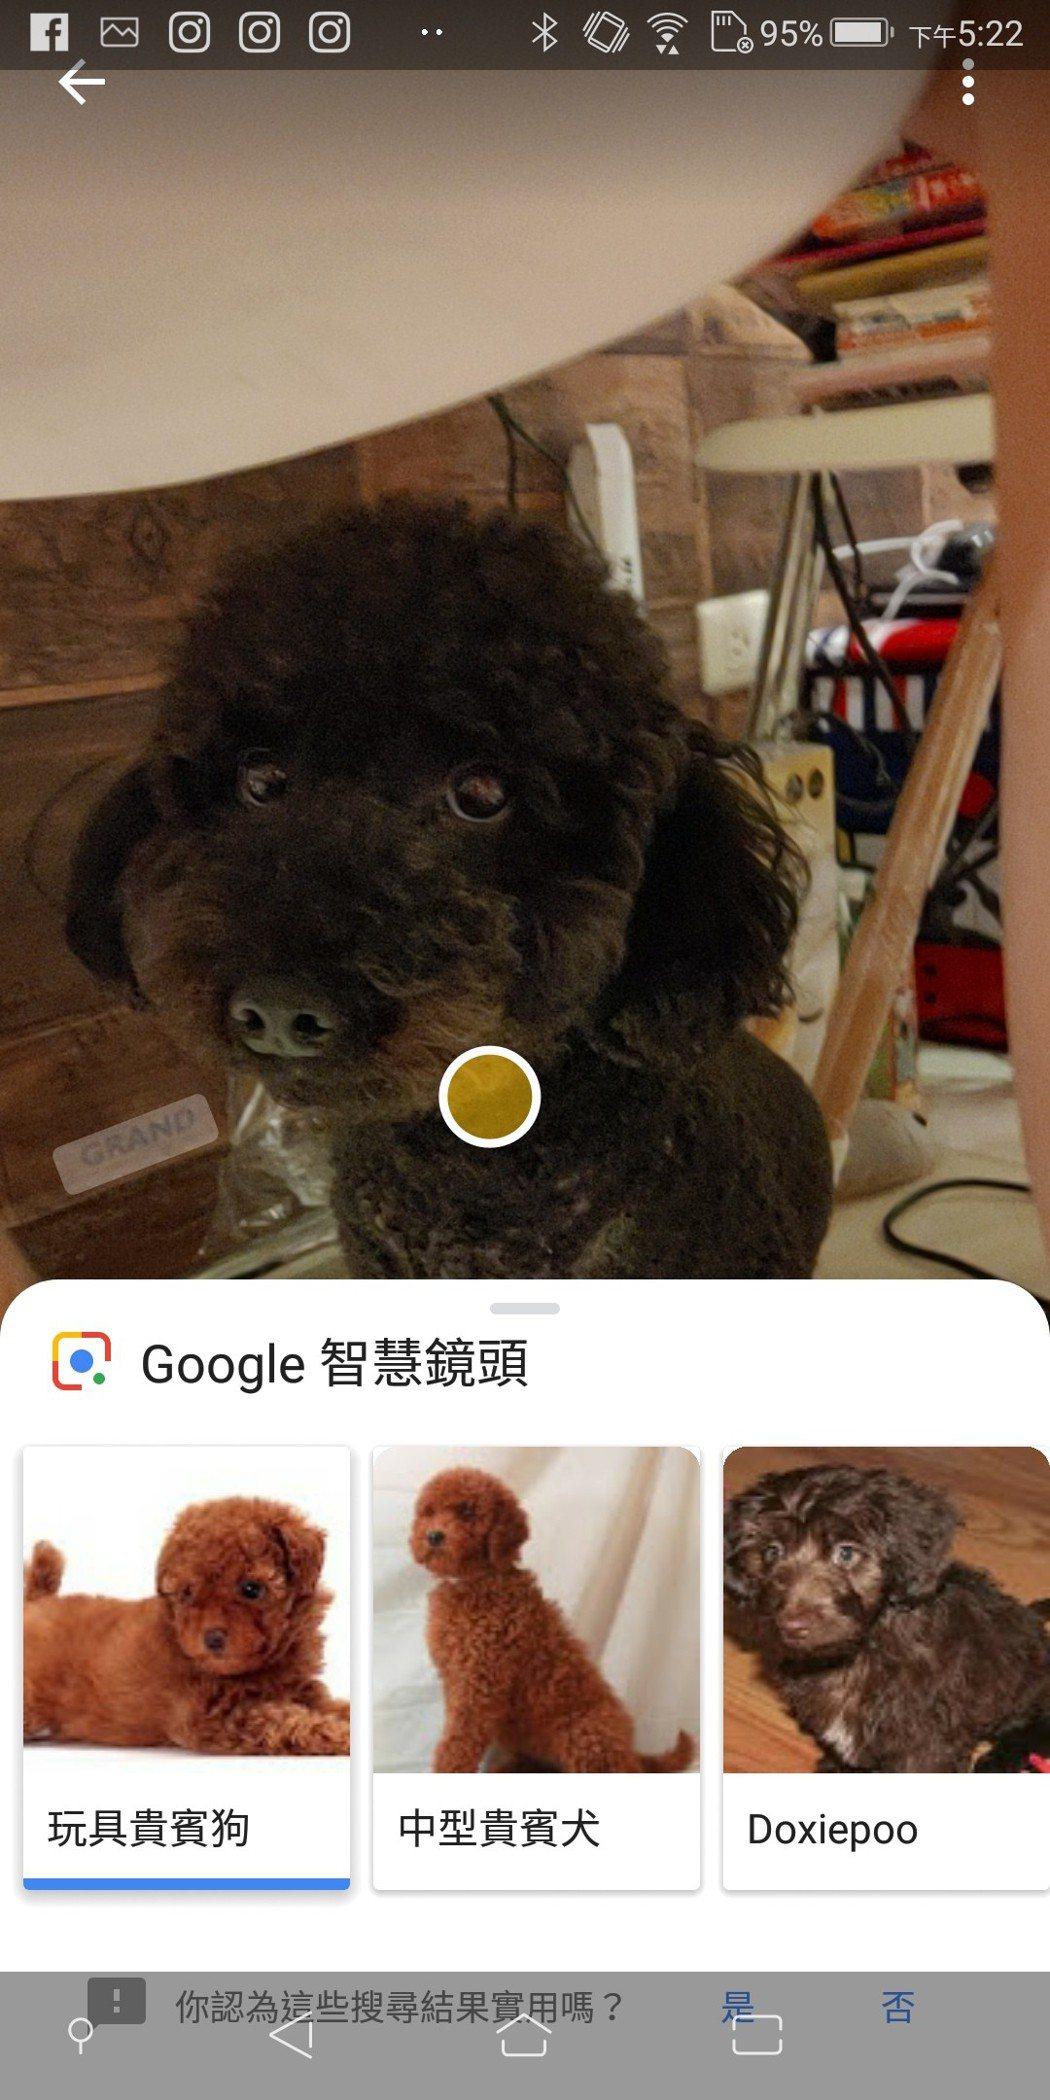 Google智慧鏡頭速度也頗快。 彭子豪/攝影